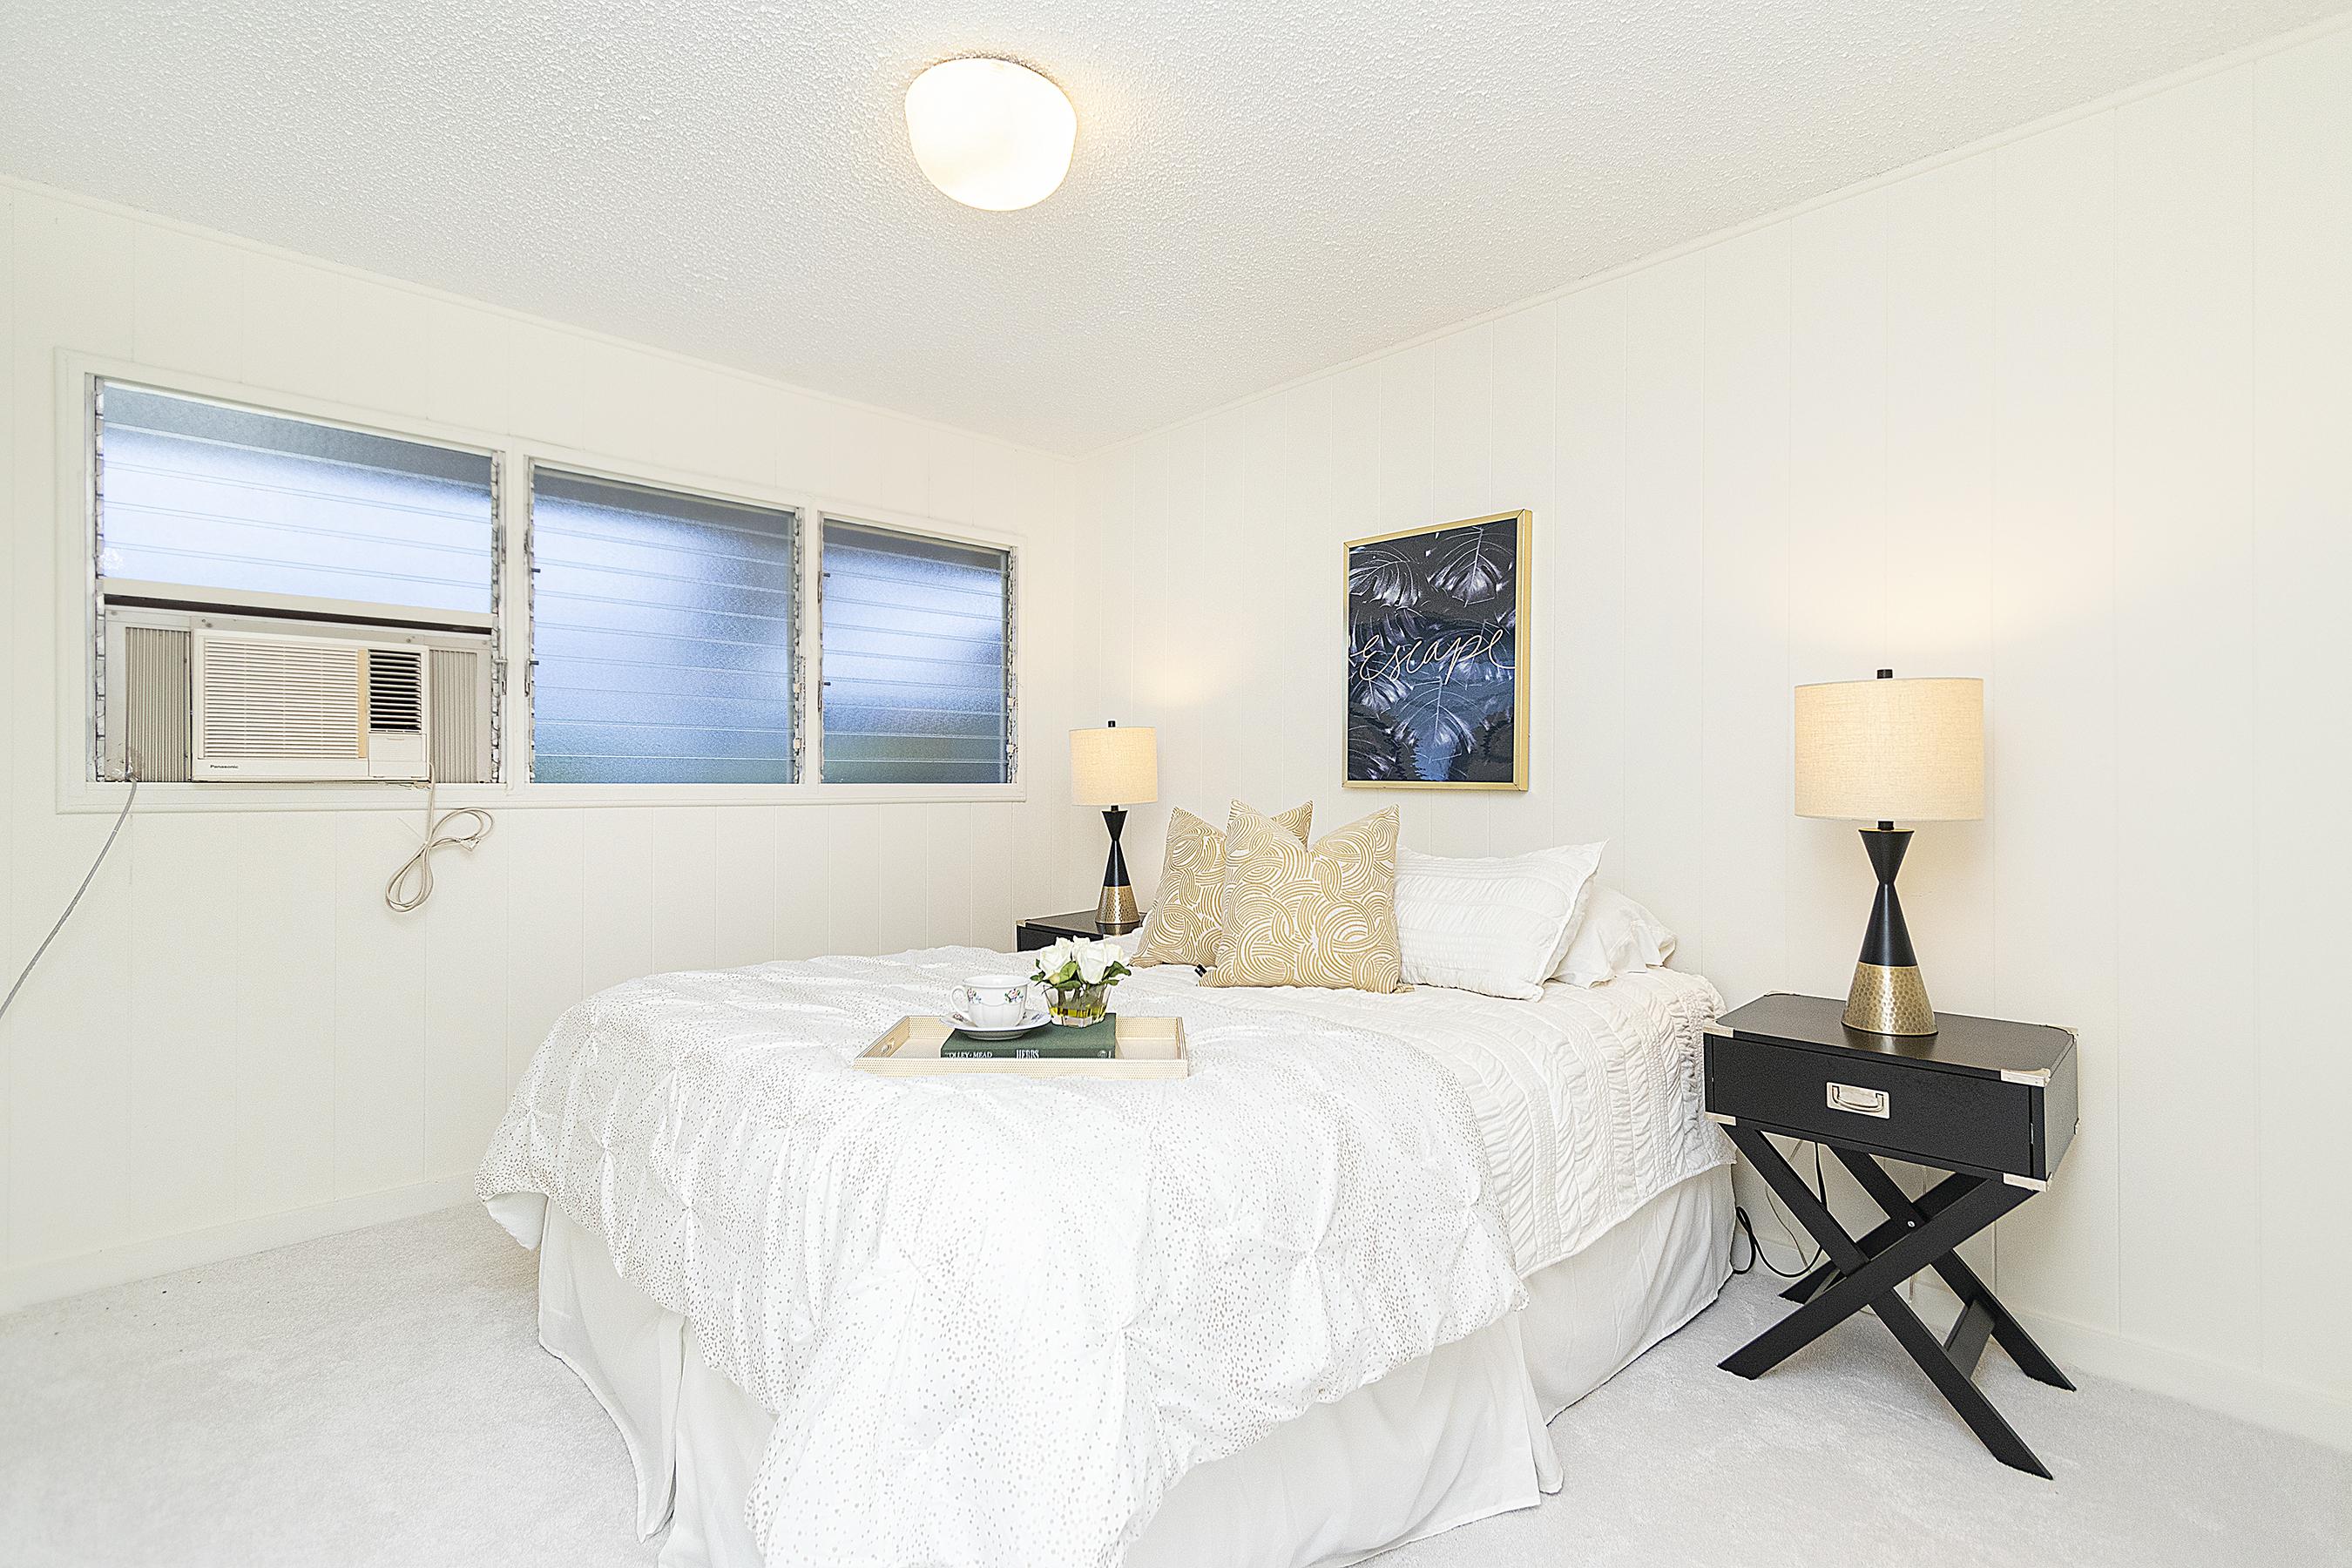 Third Bedroom at 380 Puiwa Road, Honolulu, HI 96817